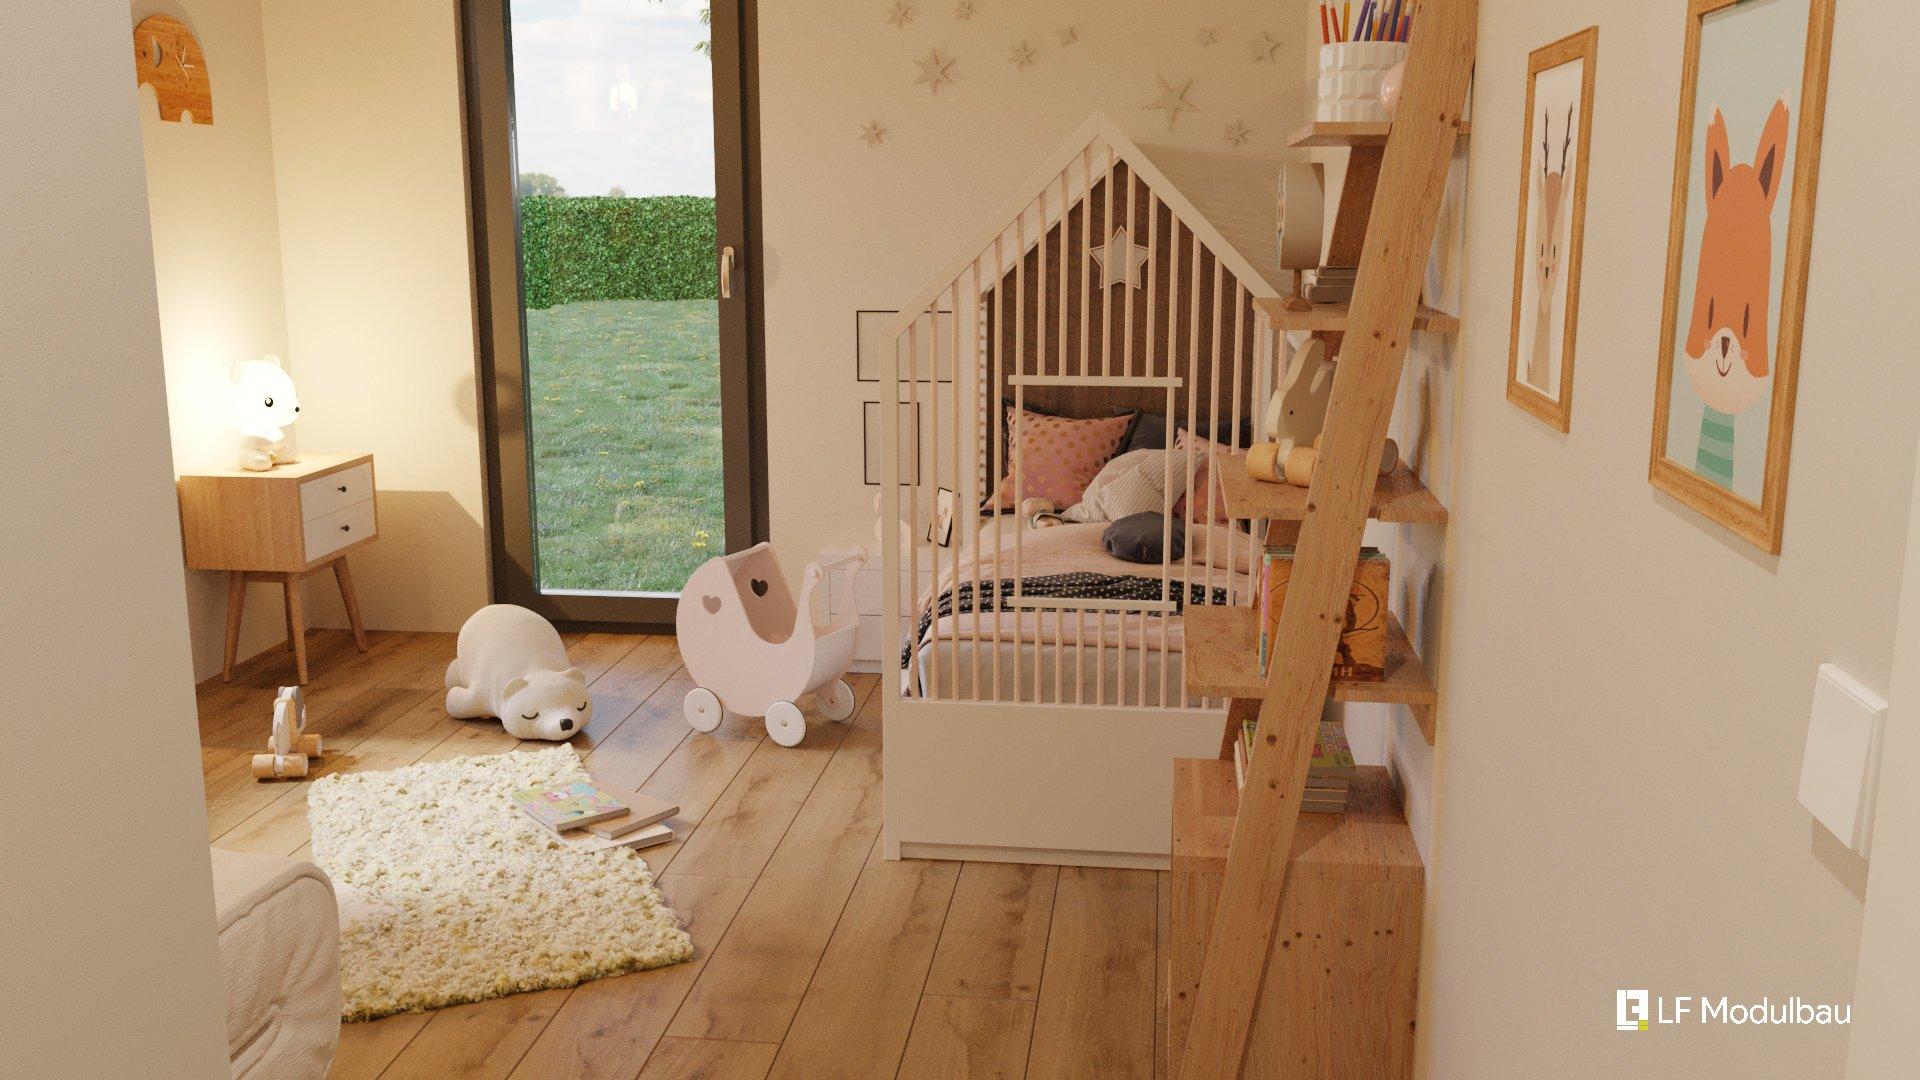 Das Kinderzimmer unseres Fertighauses in Modulbauweise - LF Home III